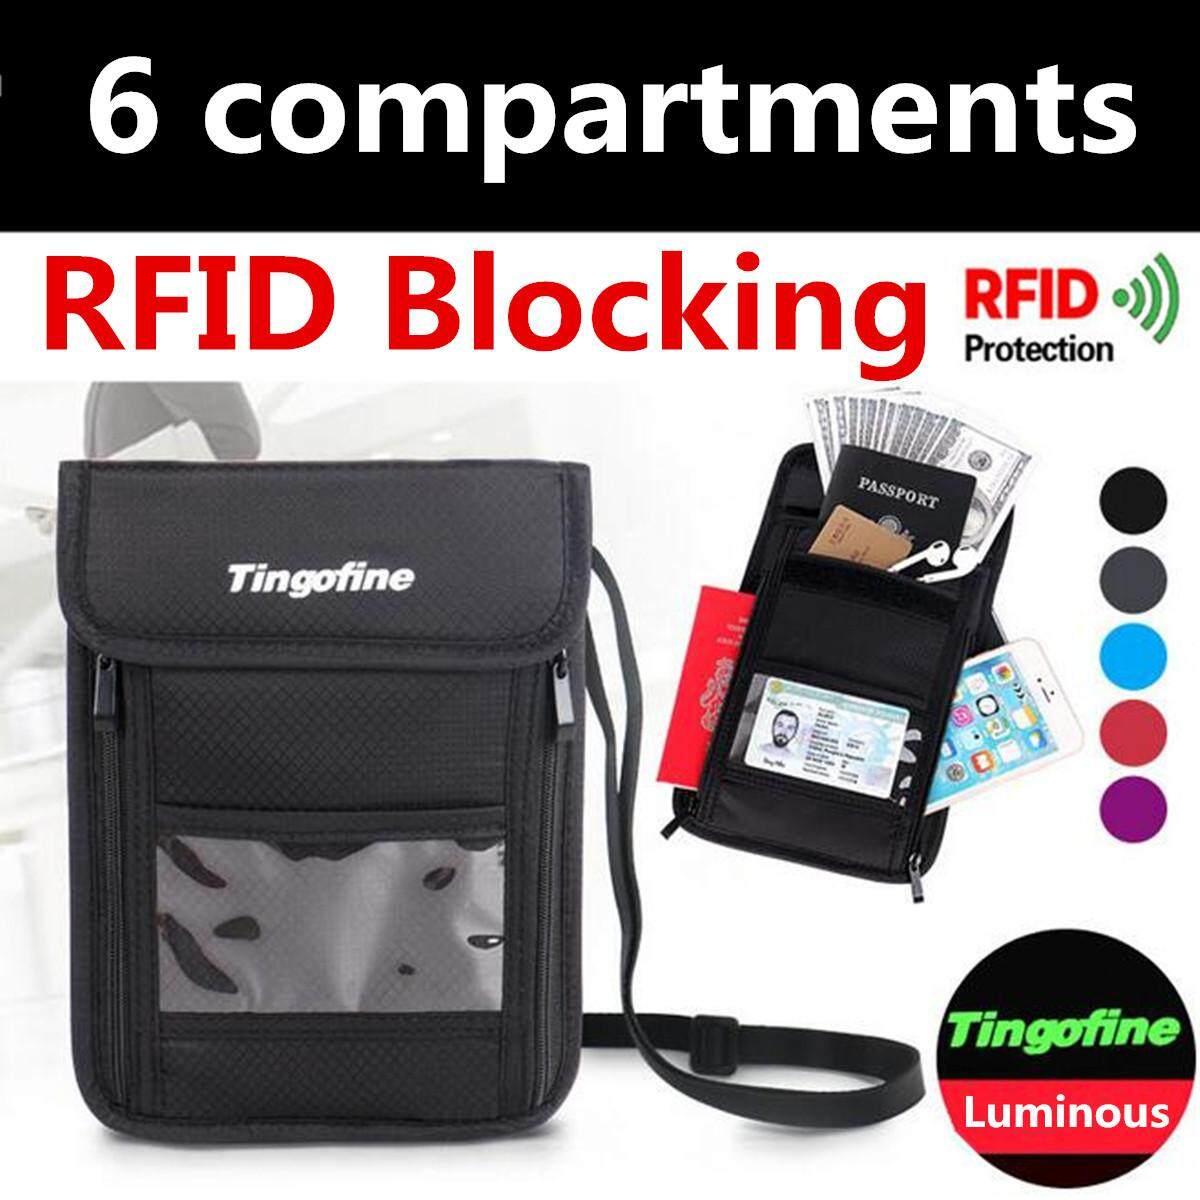 cc954a8c463 Rfid Blocking Passport Card Holder Neck Stash Pouch Security Travel Wallet  Bag Grey By Moonbeam.